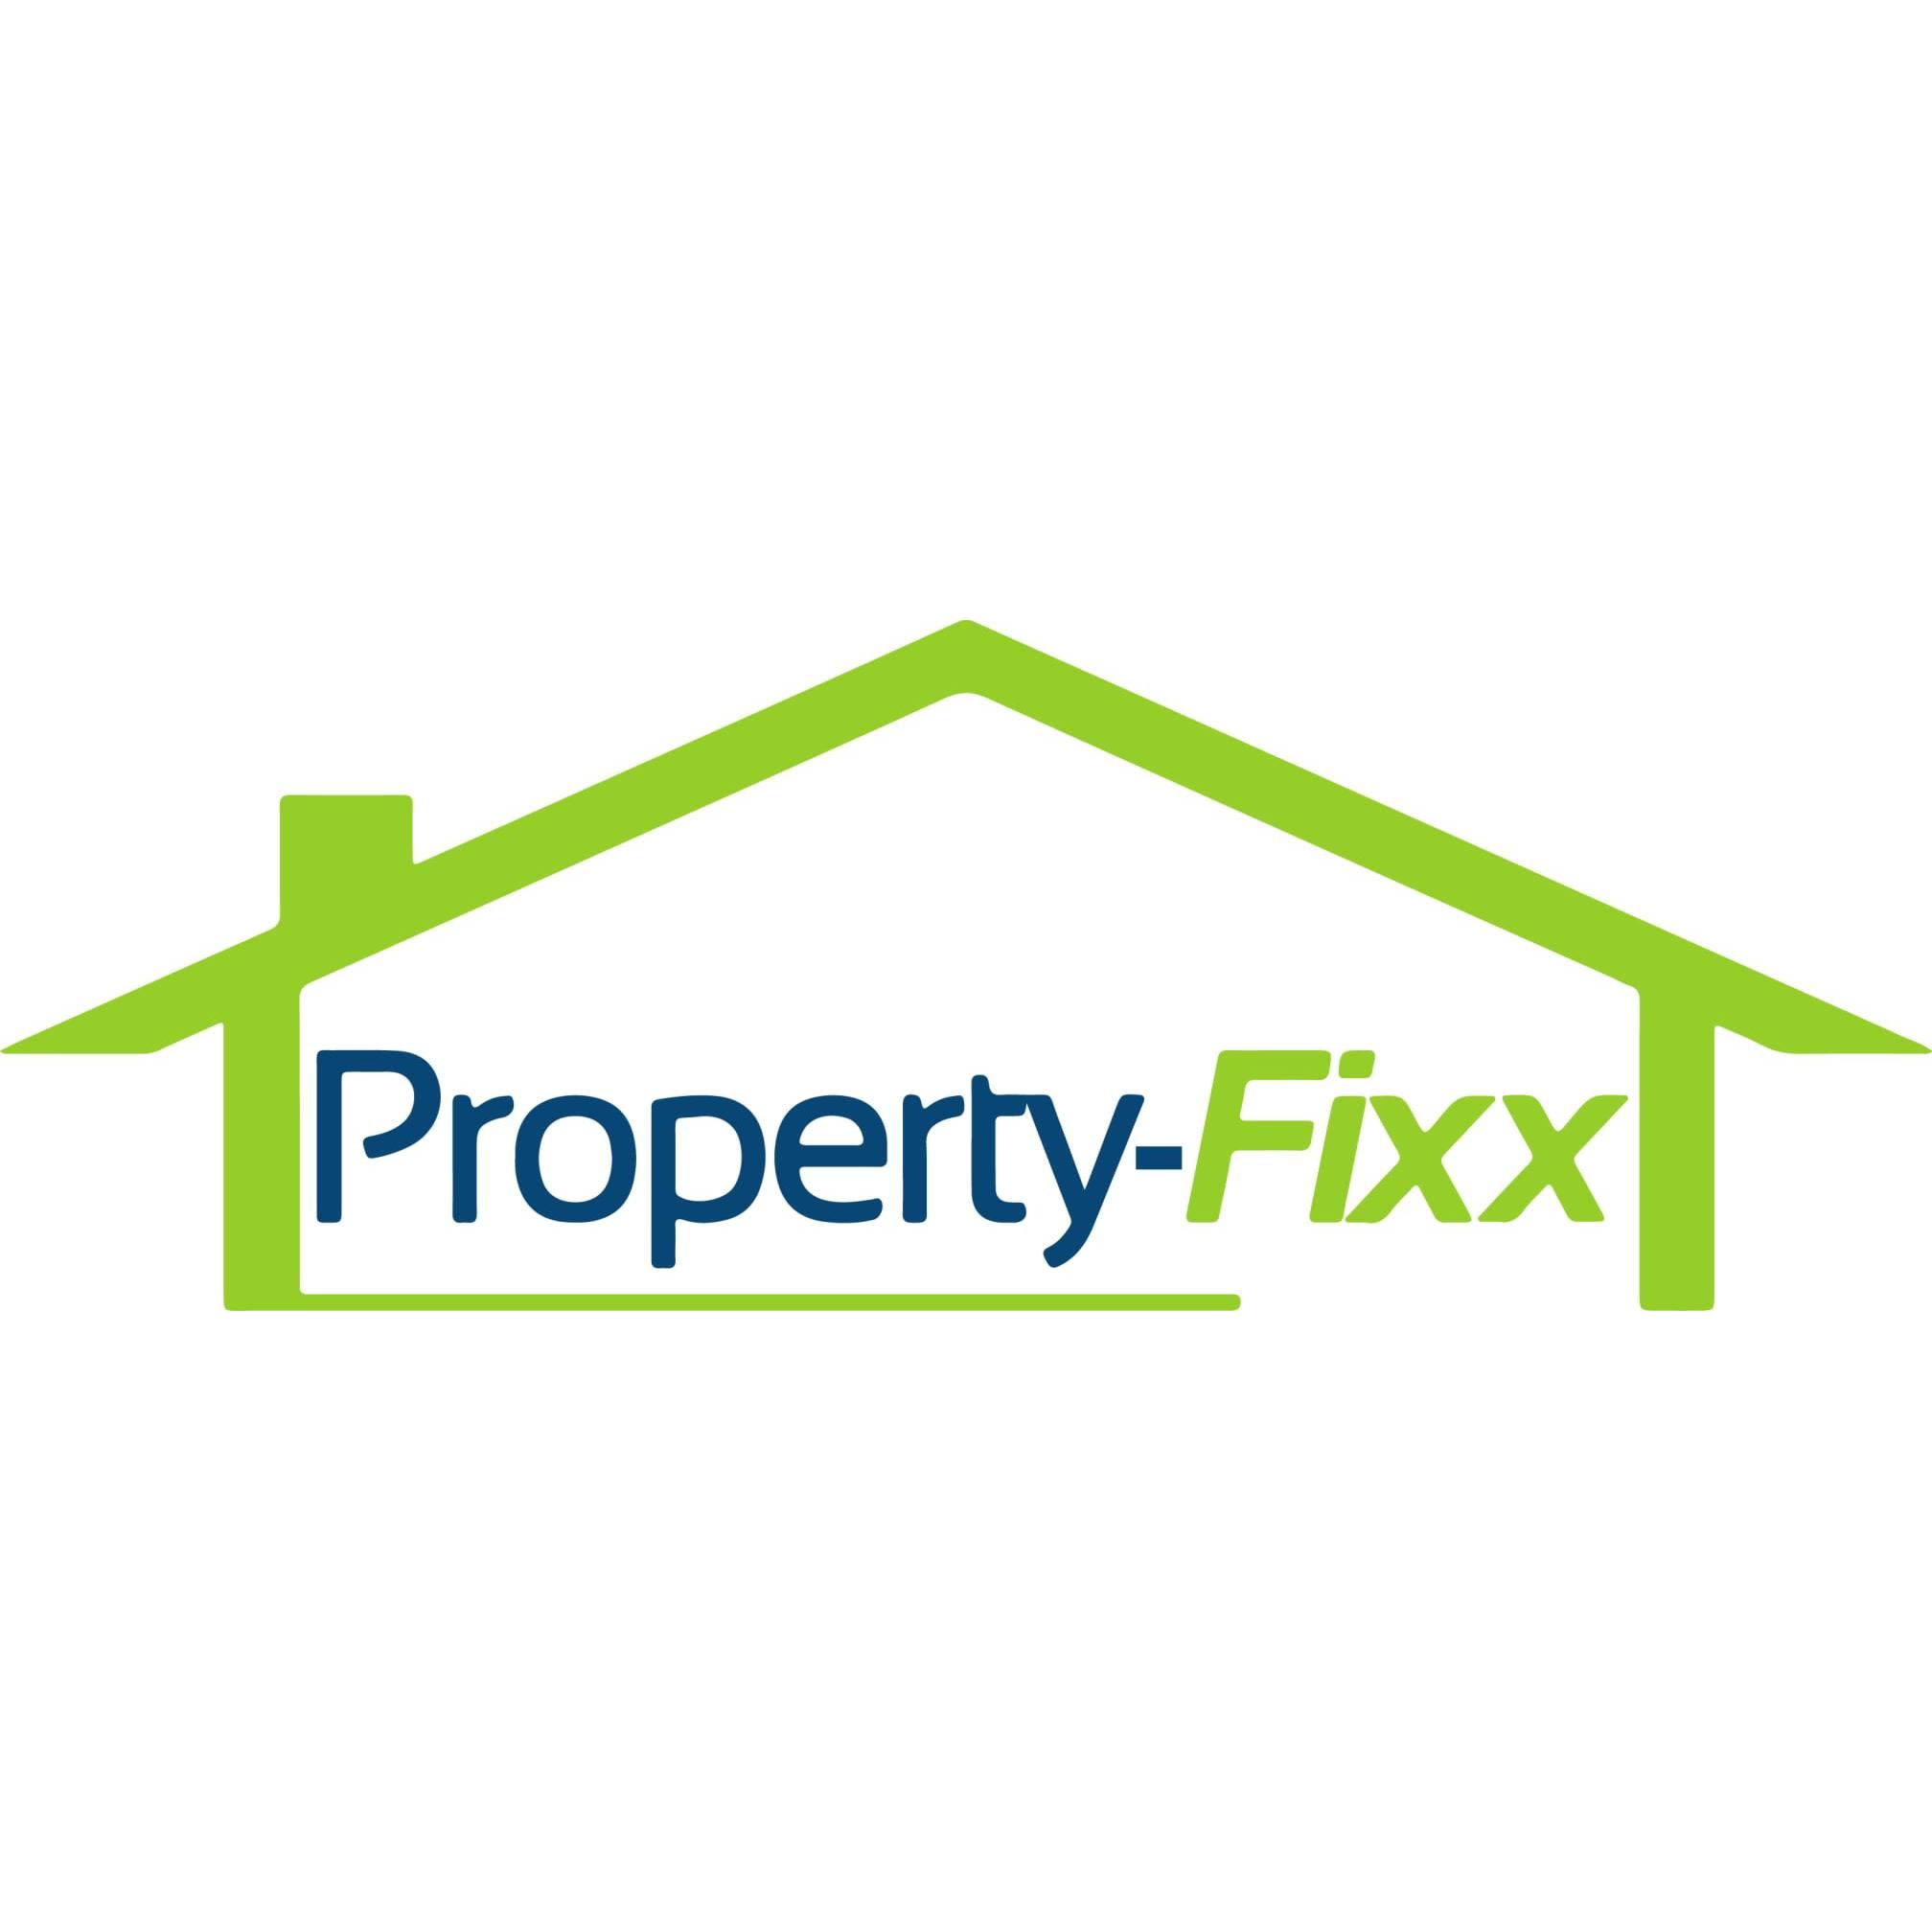 Property-Fixx